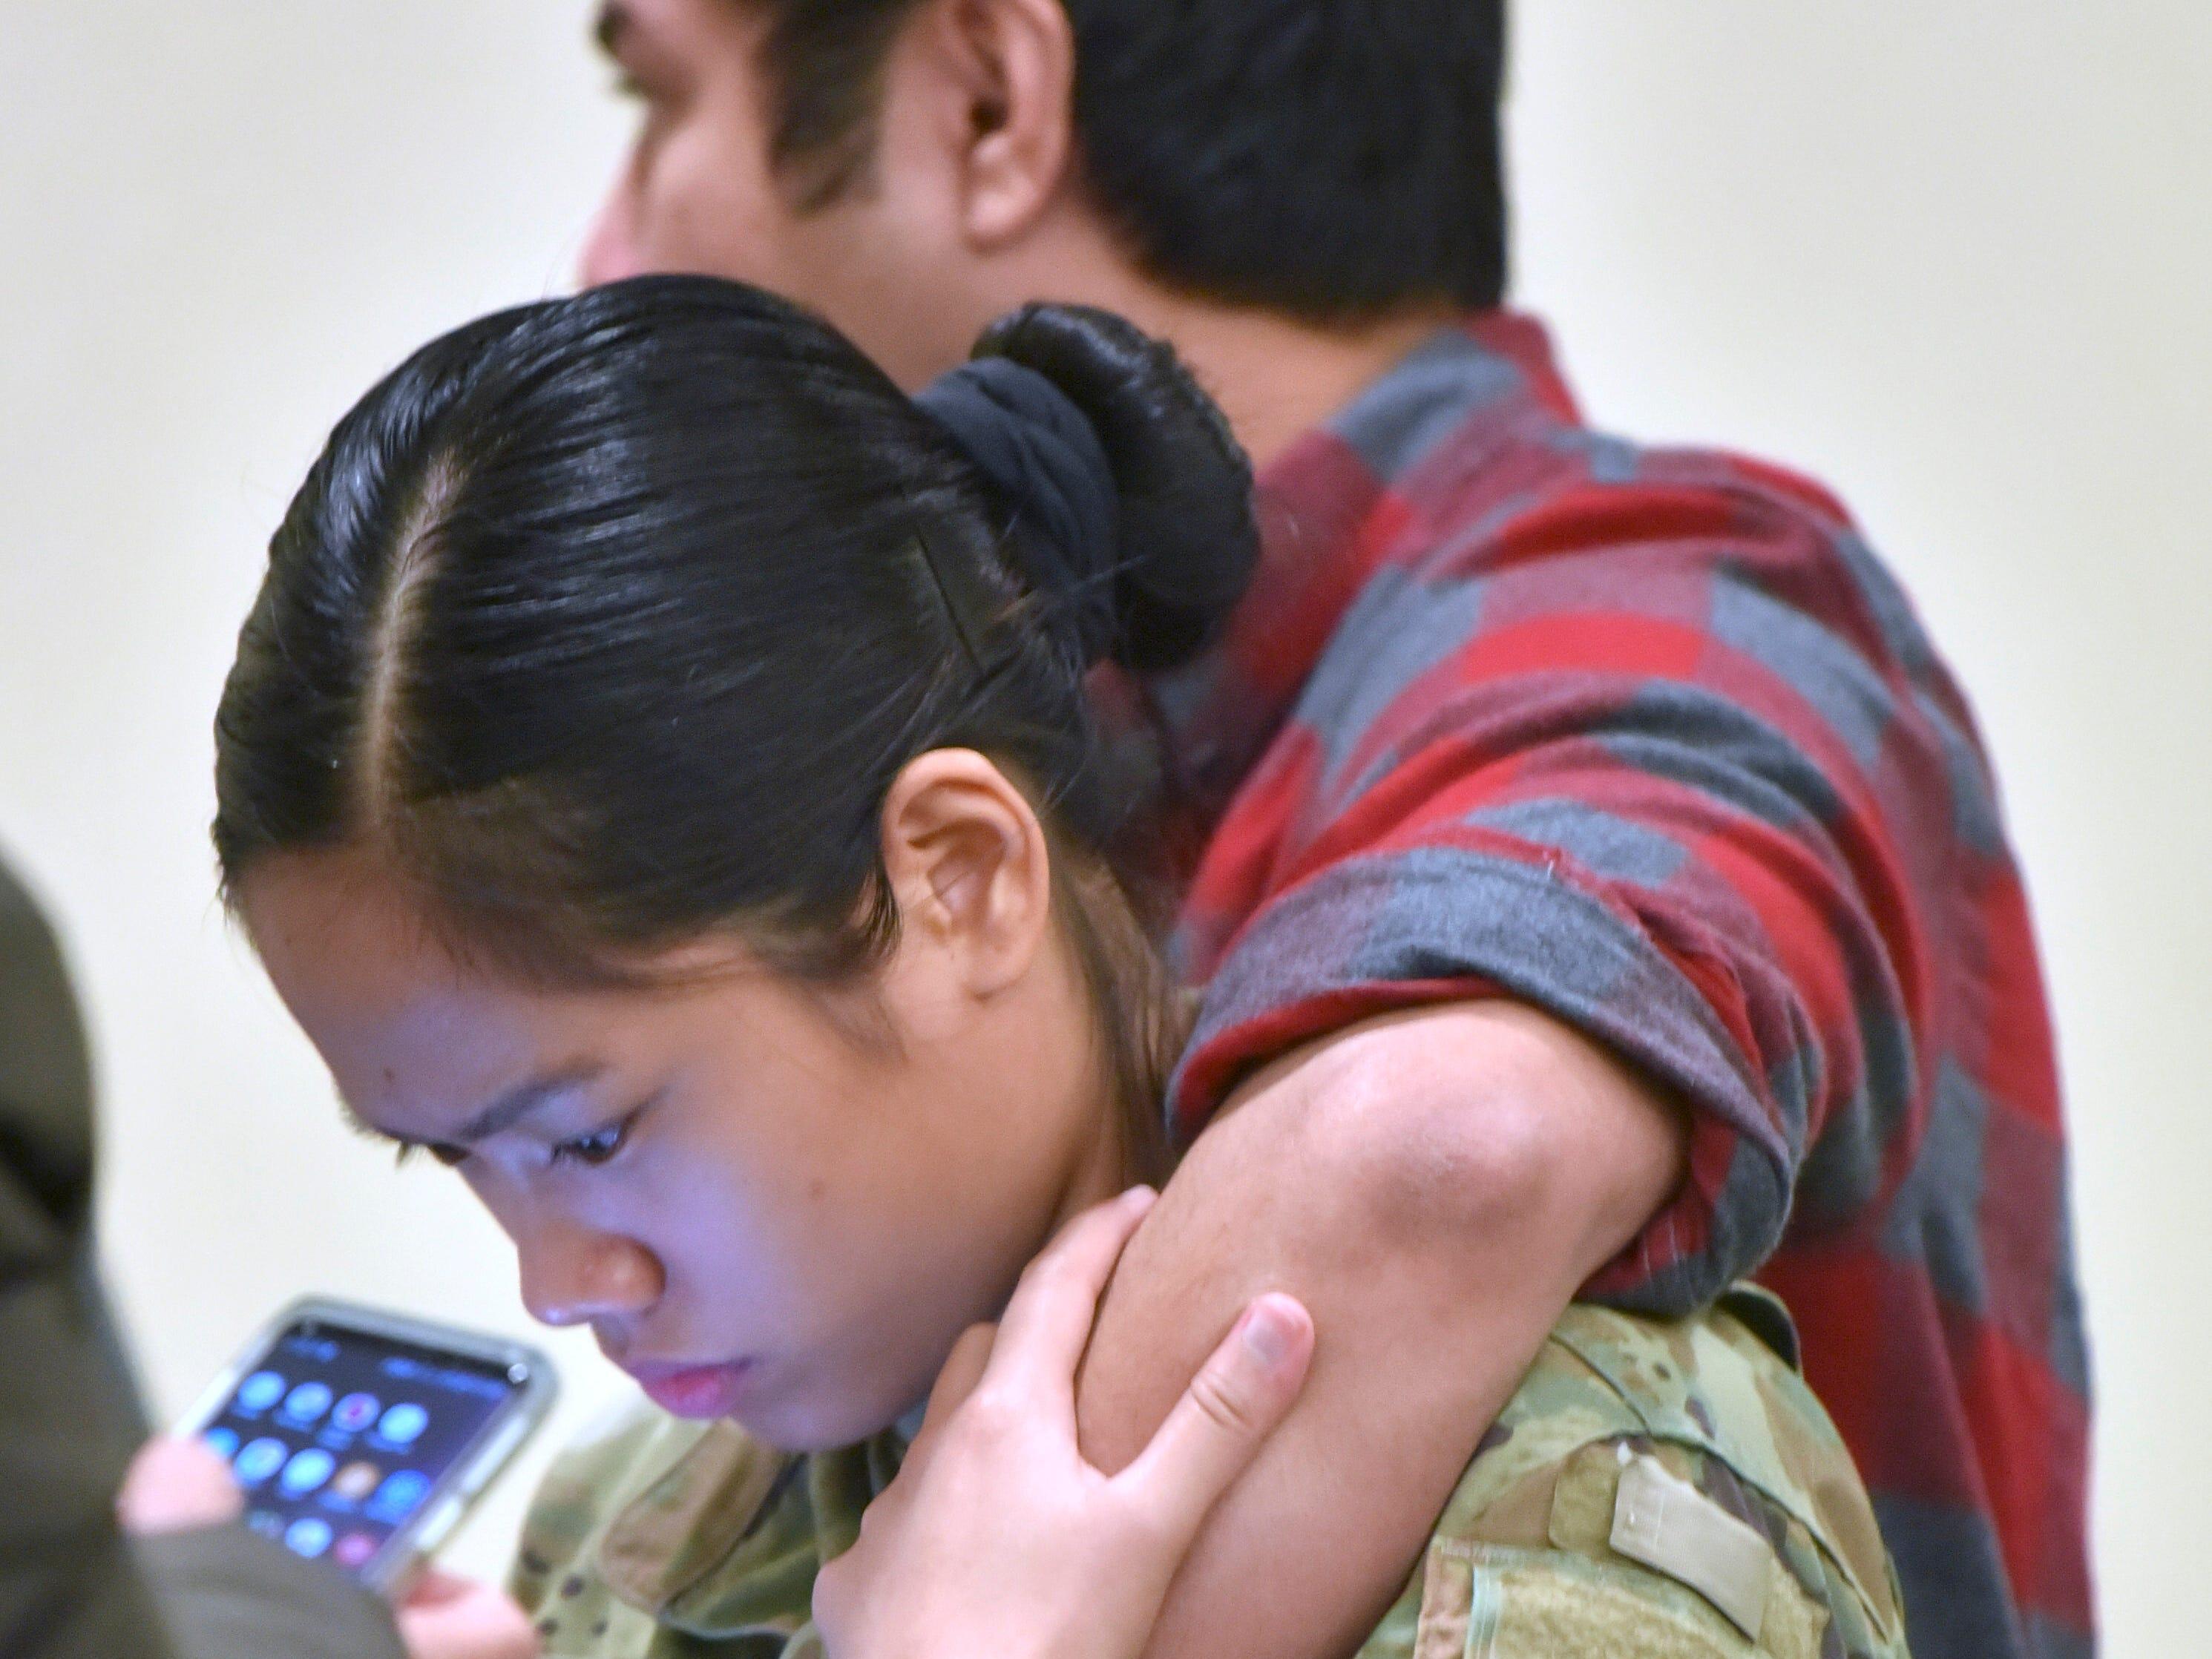 Radhwan Tannira puts his arm around his girlfriend E4 Specialist Hesse Sambaan, who is also an EMU nursing student.